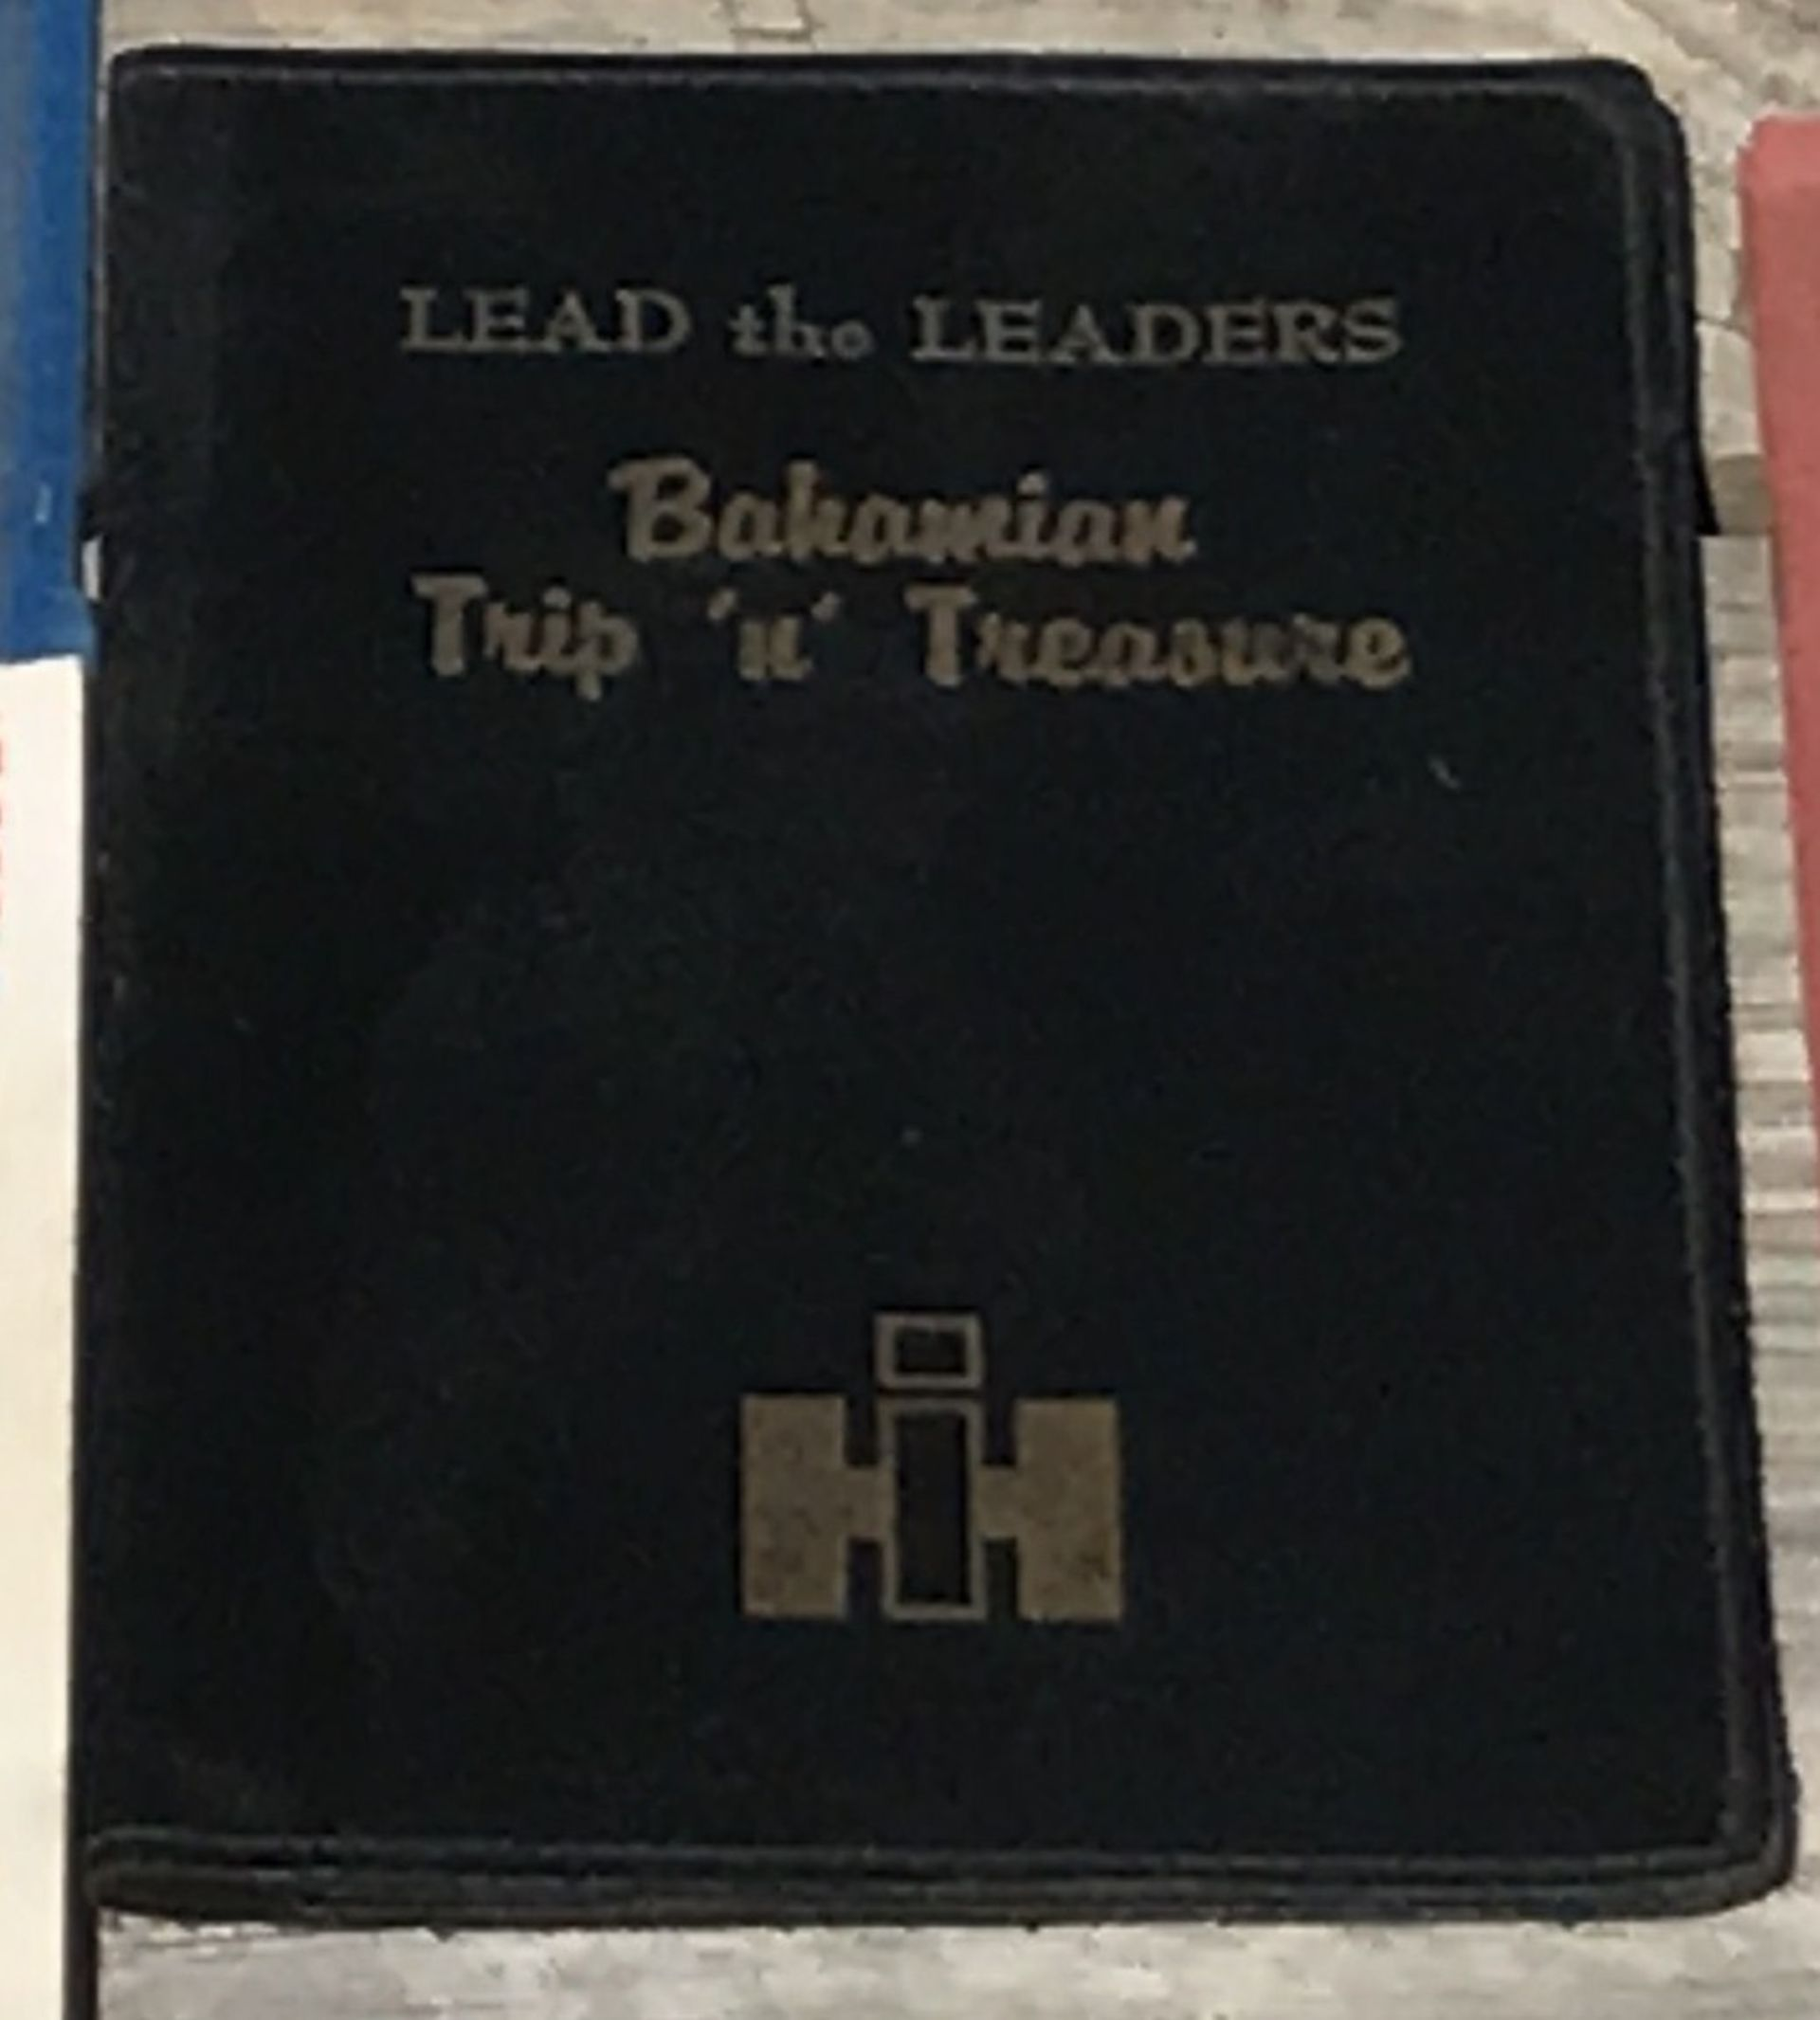 Lot 3 - Bahamian Trip-n-Treasure Ticket Holder